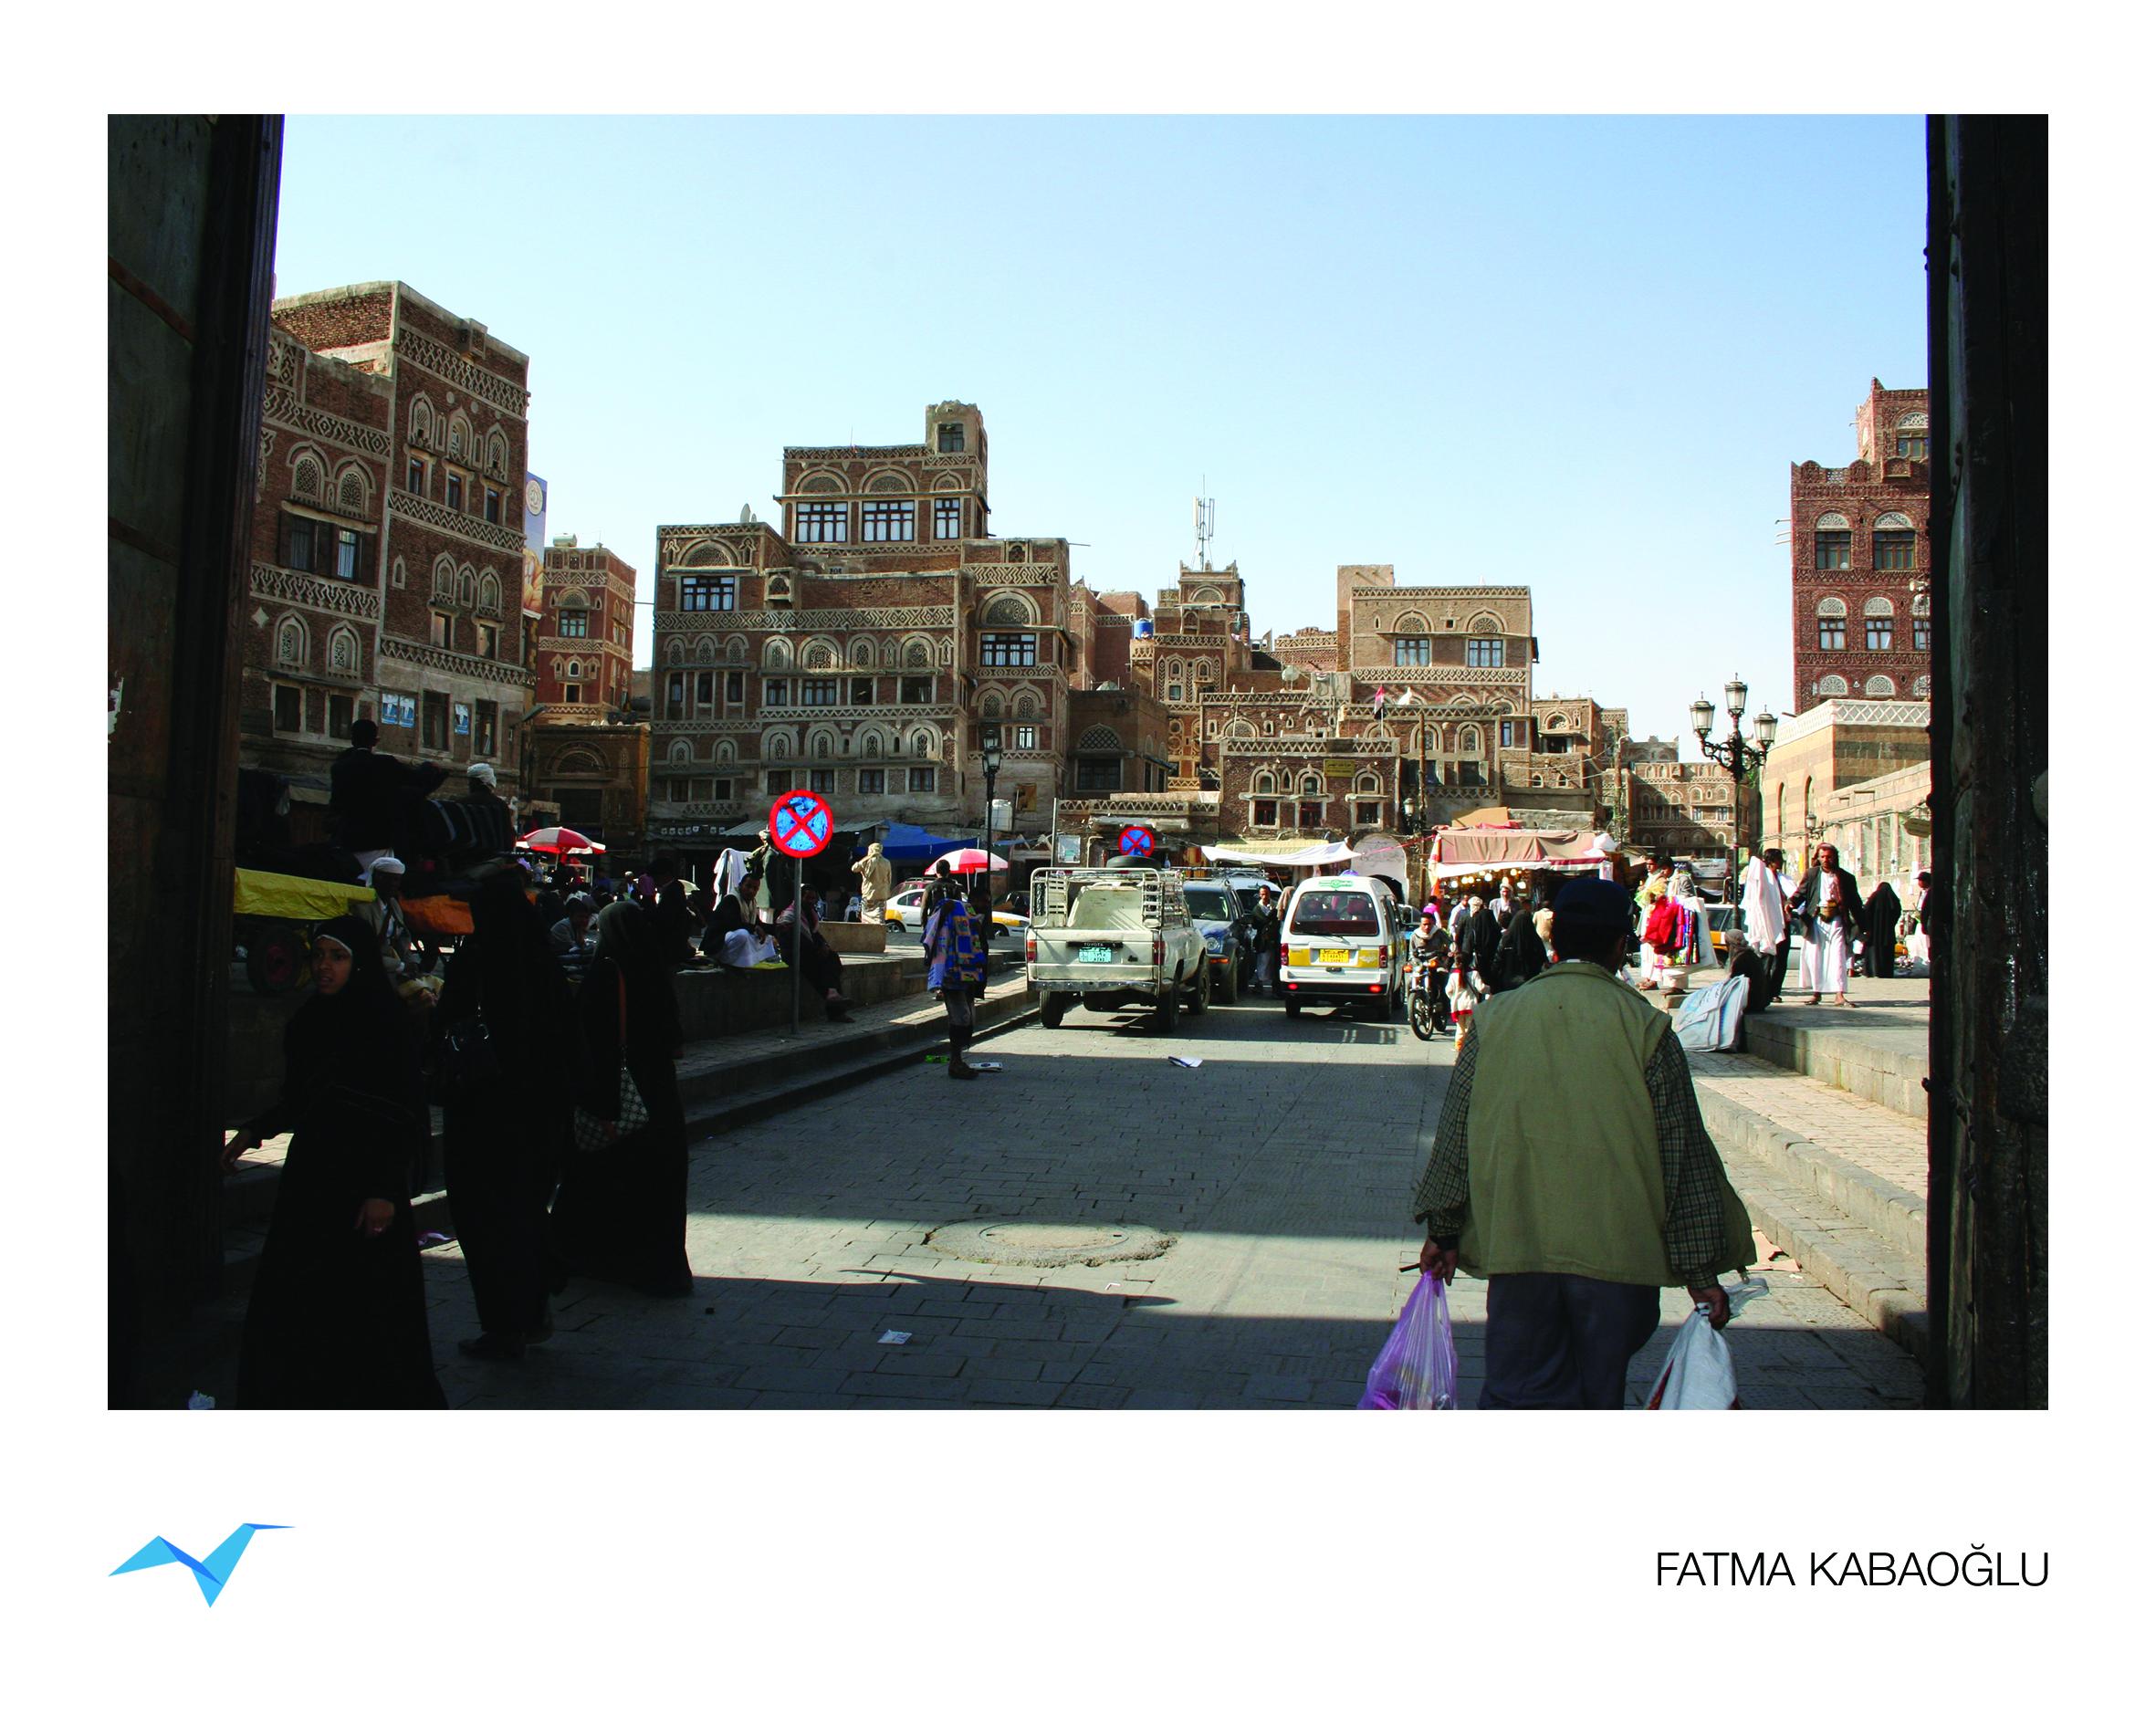 Fatma_Kabaoglu_4